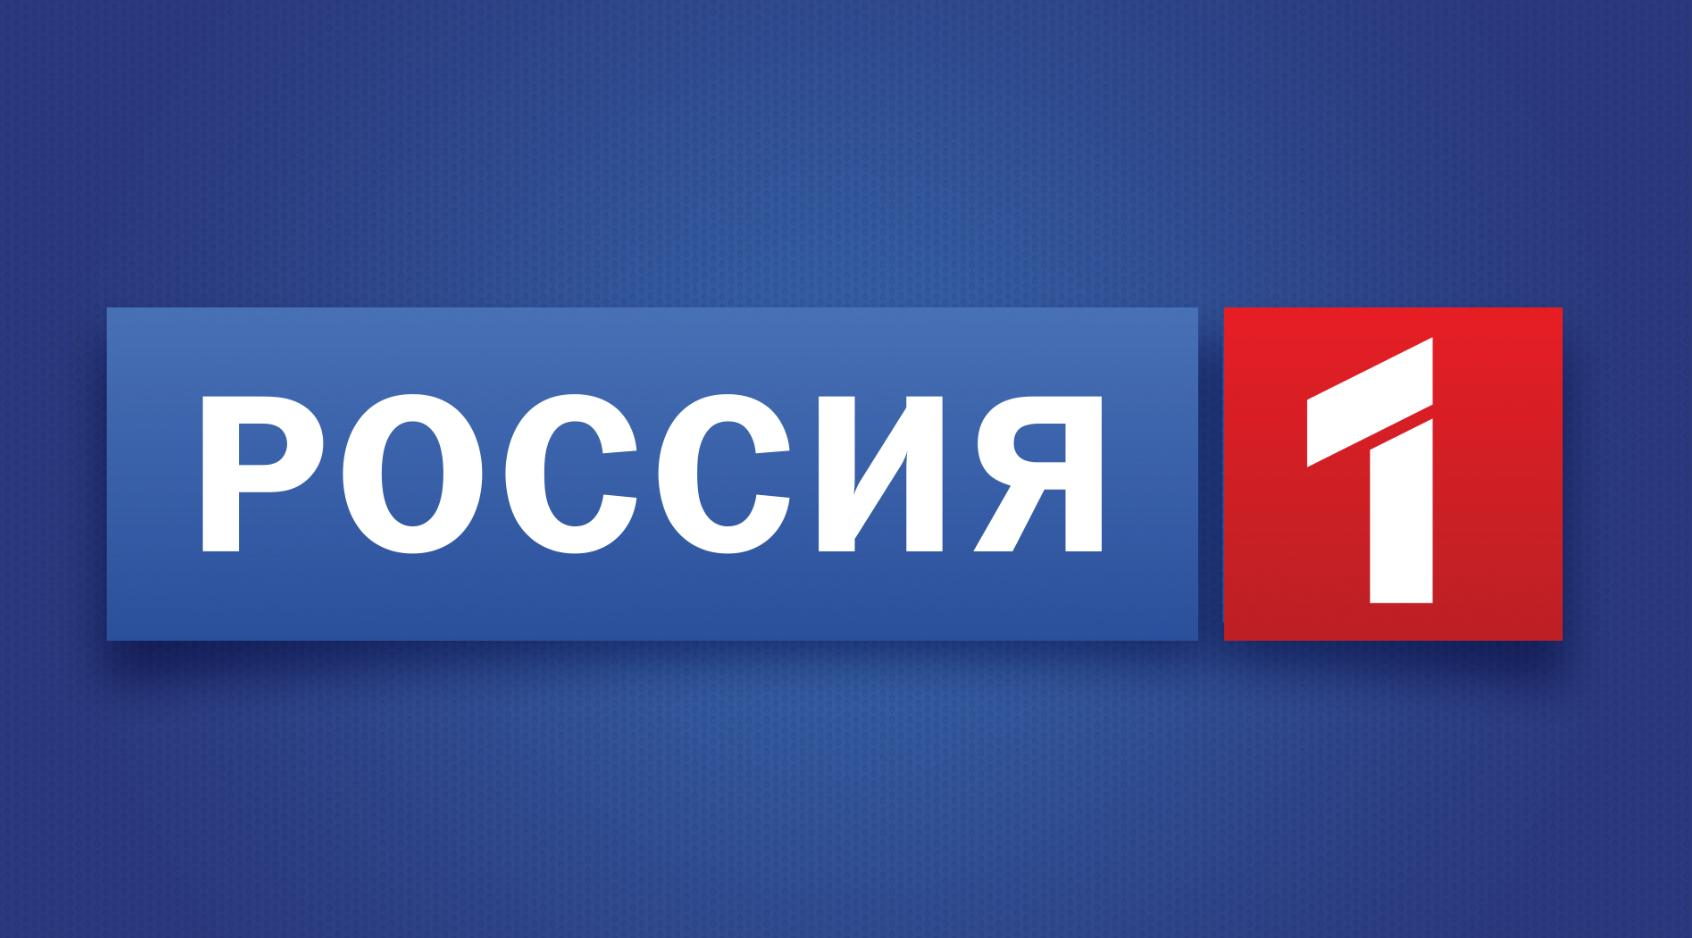 Программа тв канал россия 1 на сегодня